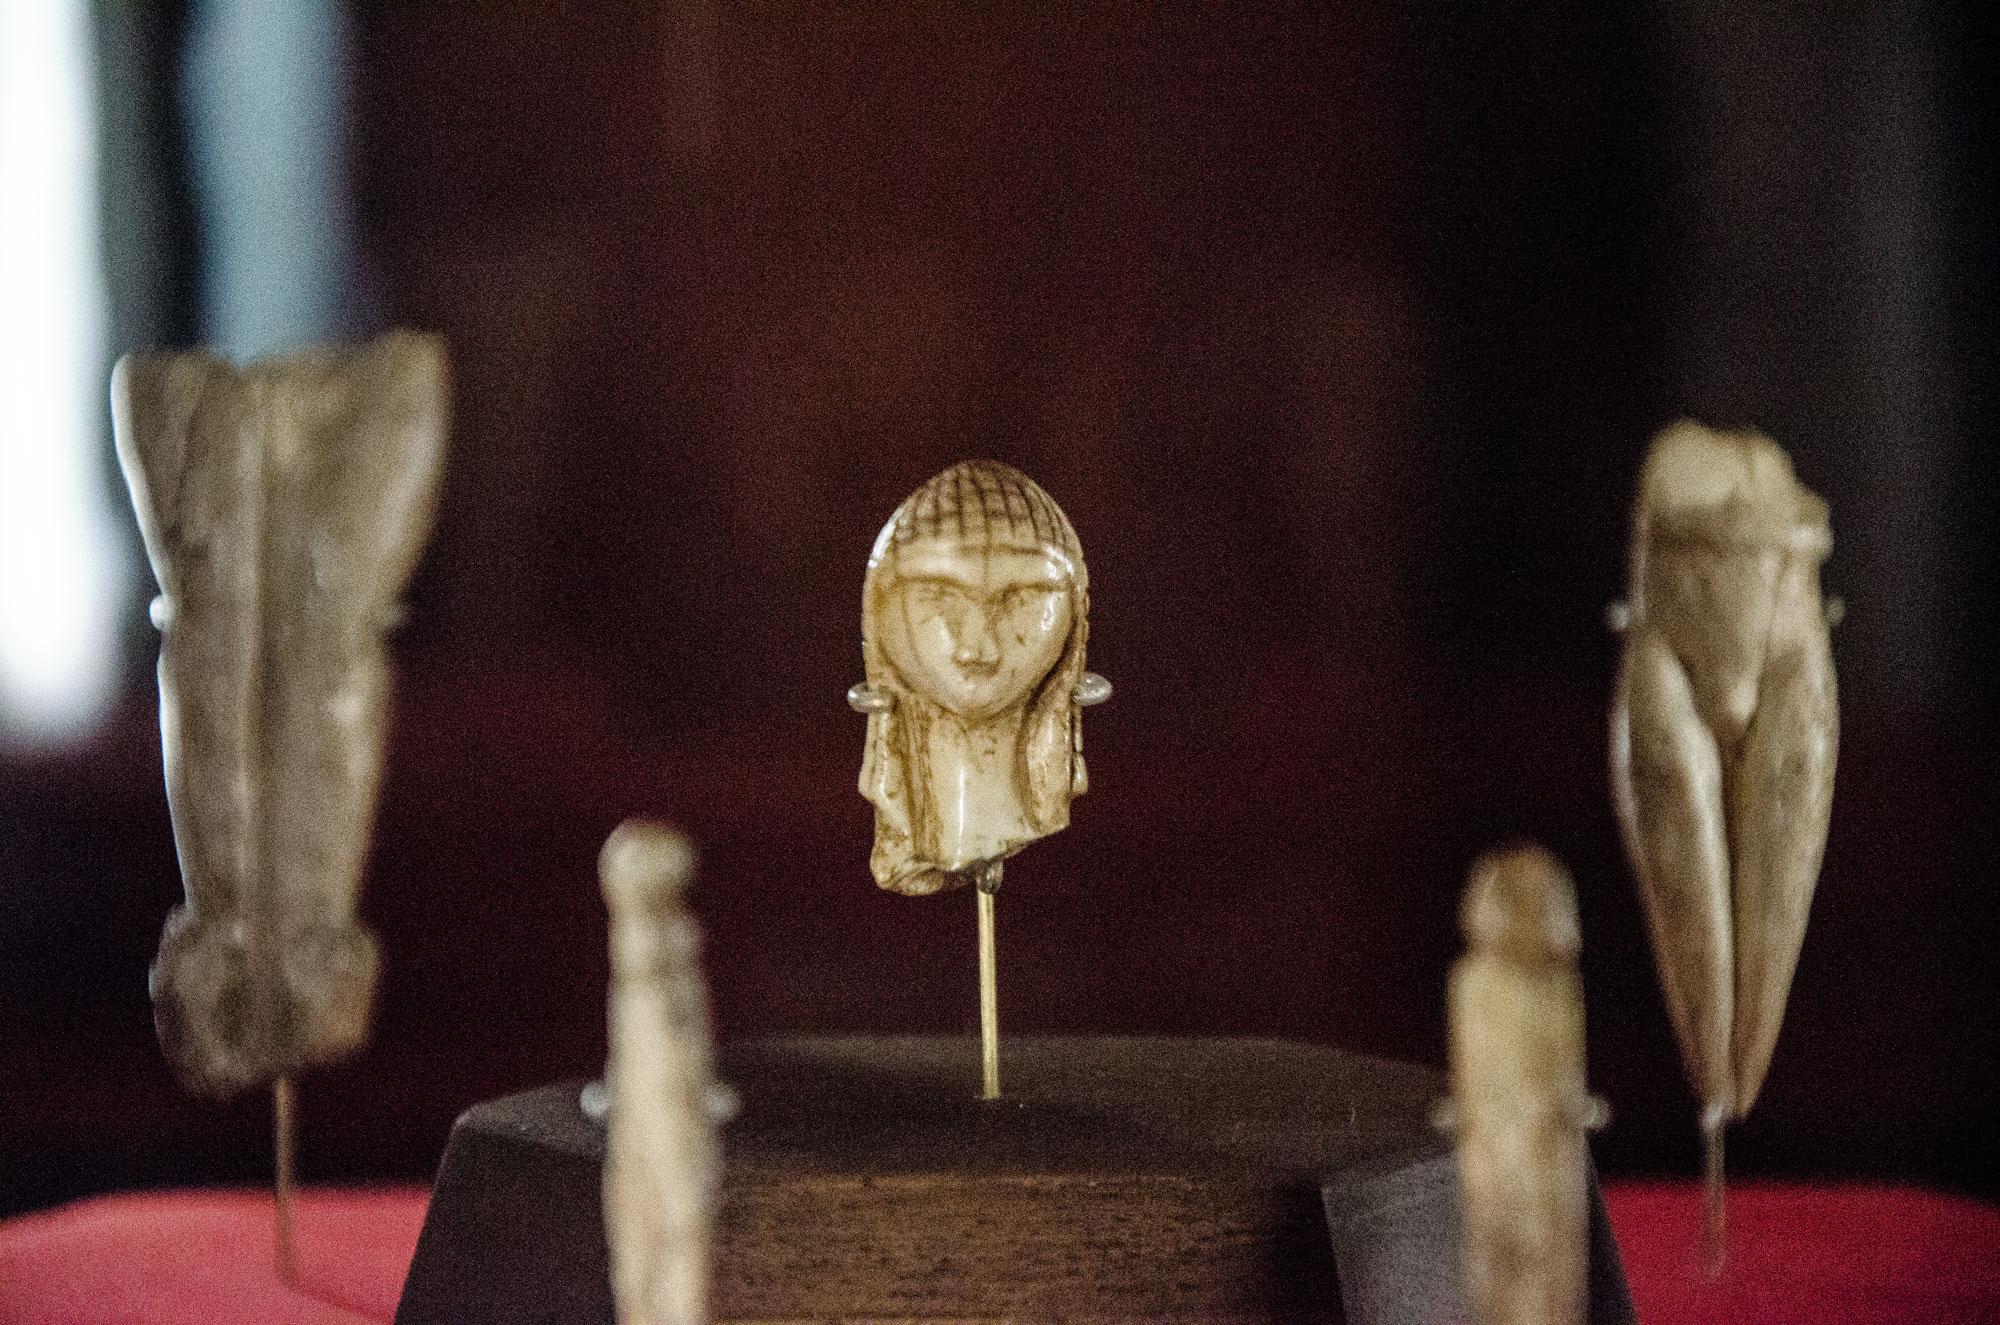 Dame de Brassempouy, Mammut-Elefenbein, ca. 21.000 v. Chr, Salle Piette, Musée d'Archéologie Nationale, Saint-Germain-en-Laye. Foto: Lothar Ruttner